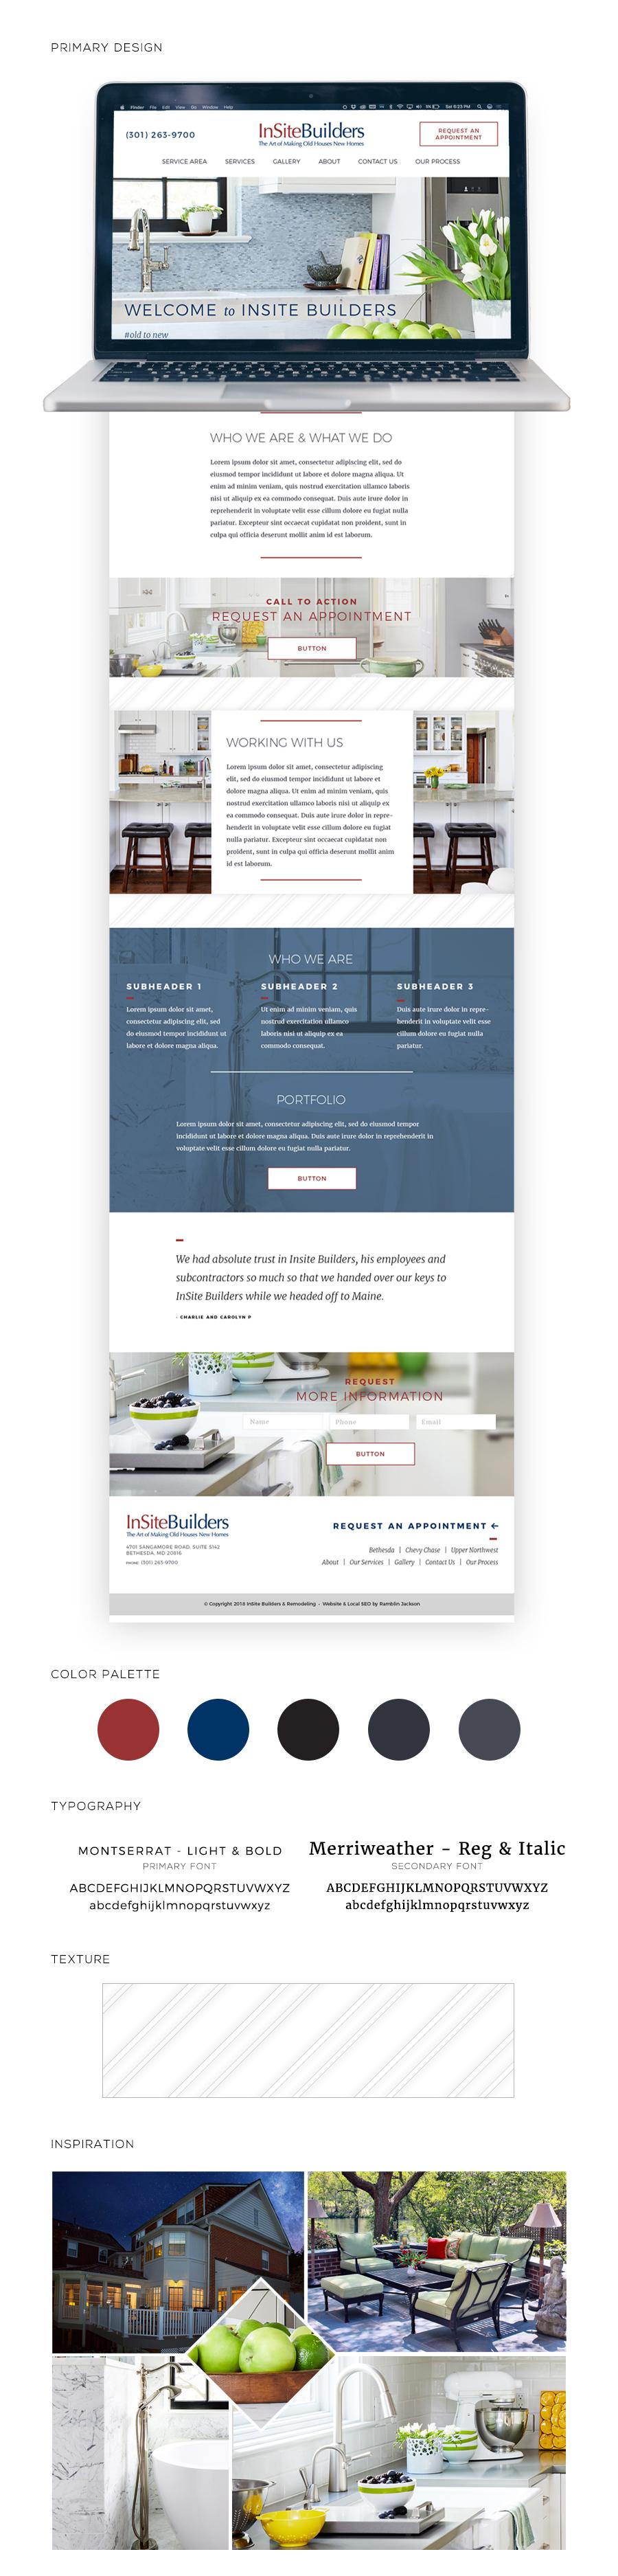 insitebuilders_branding_board.jpg